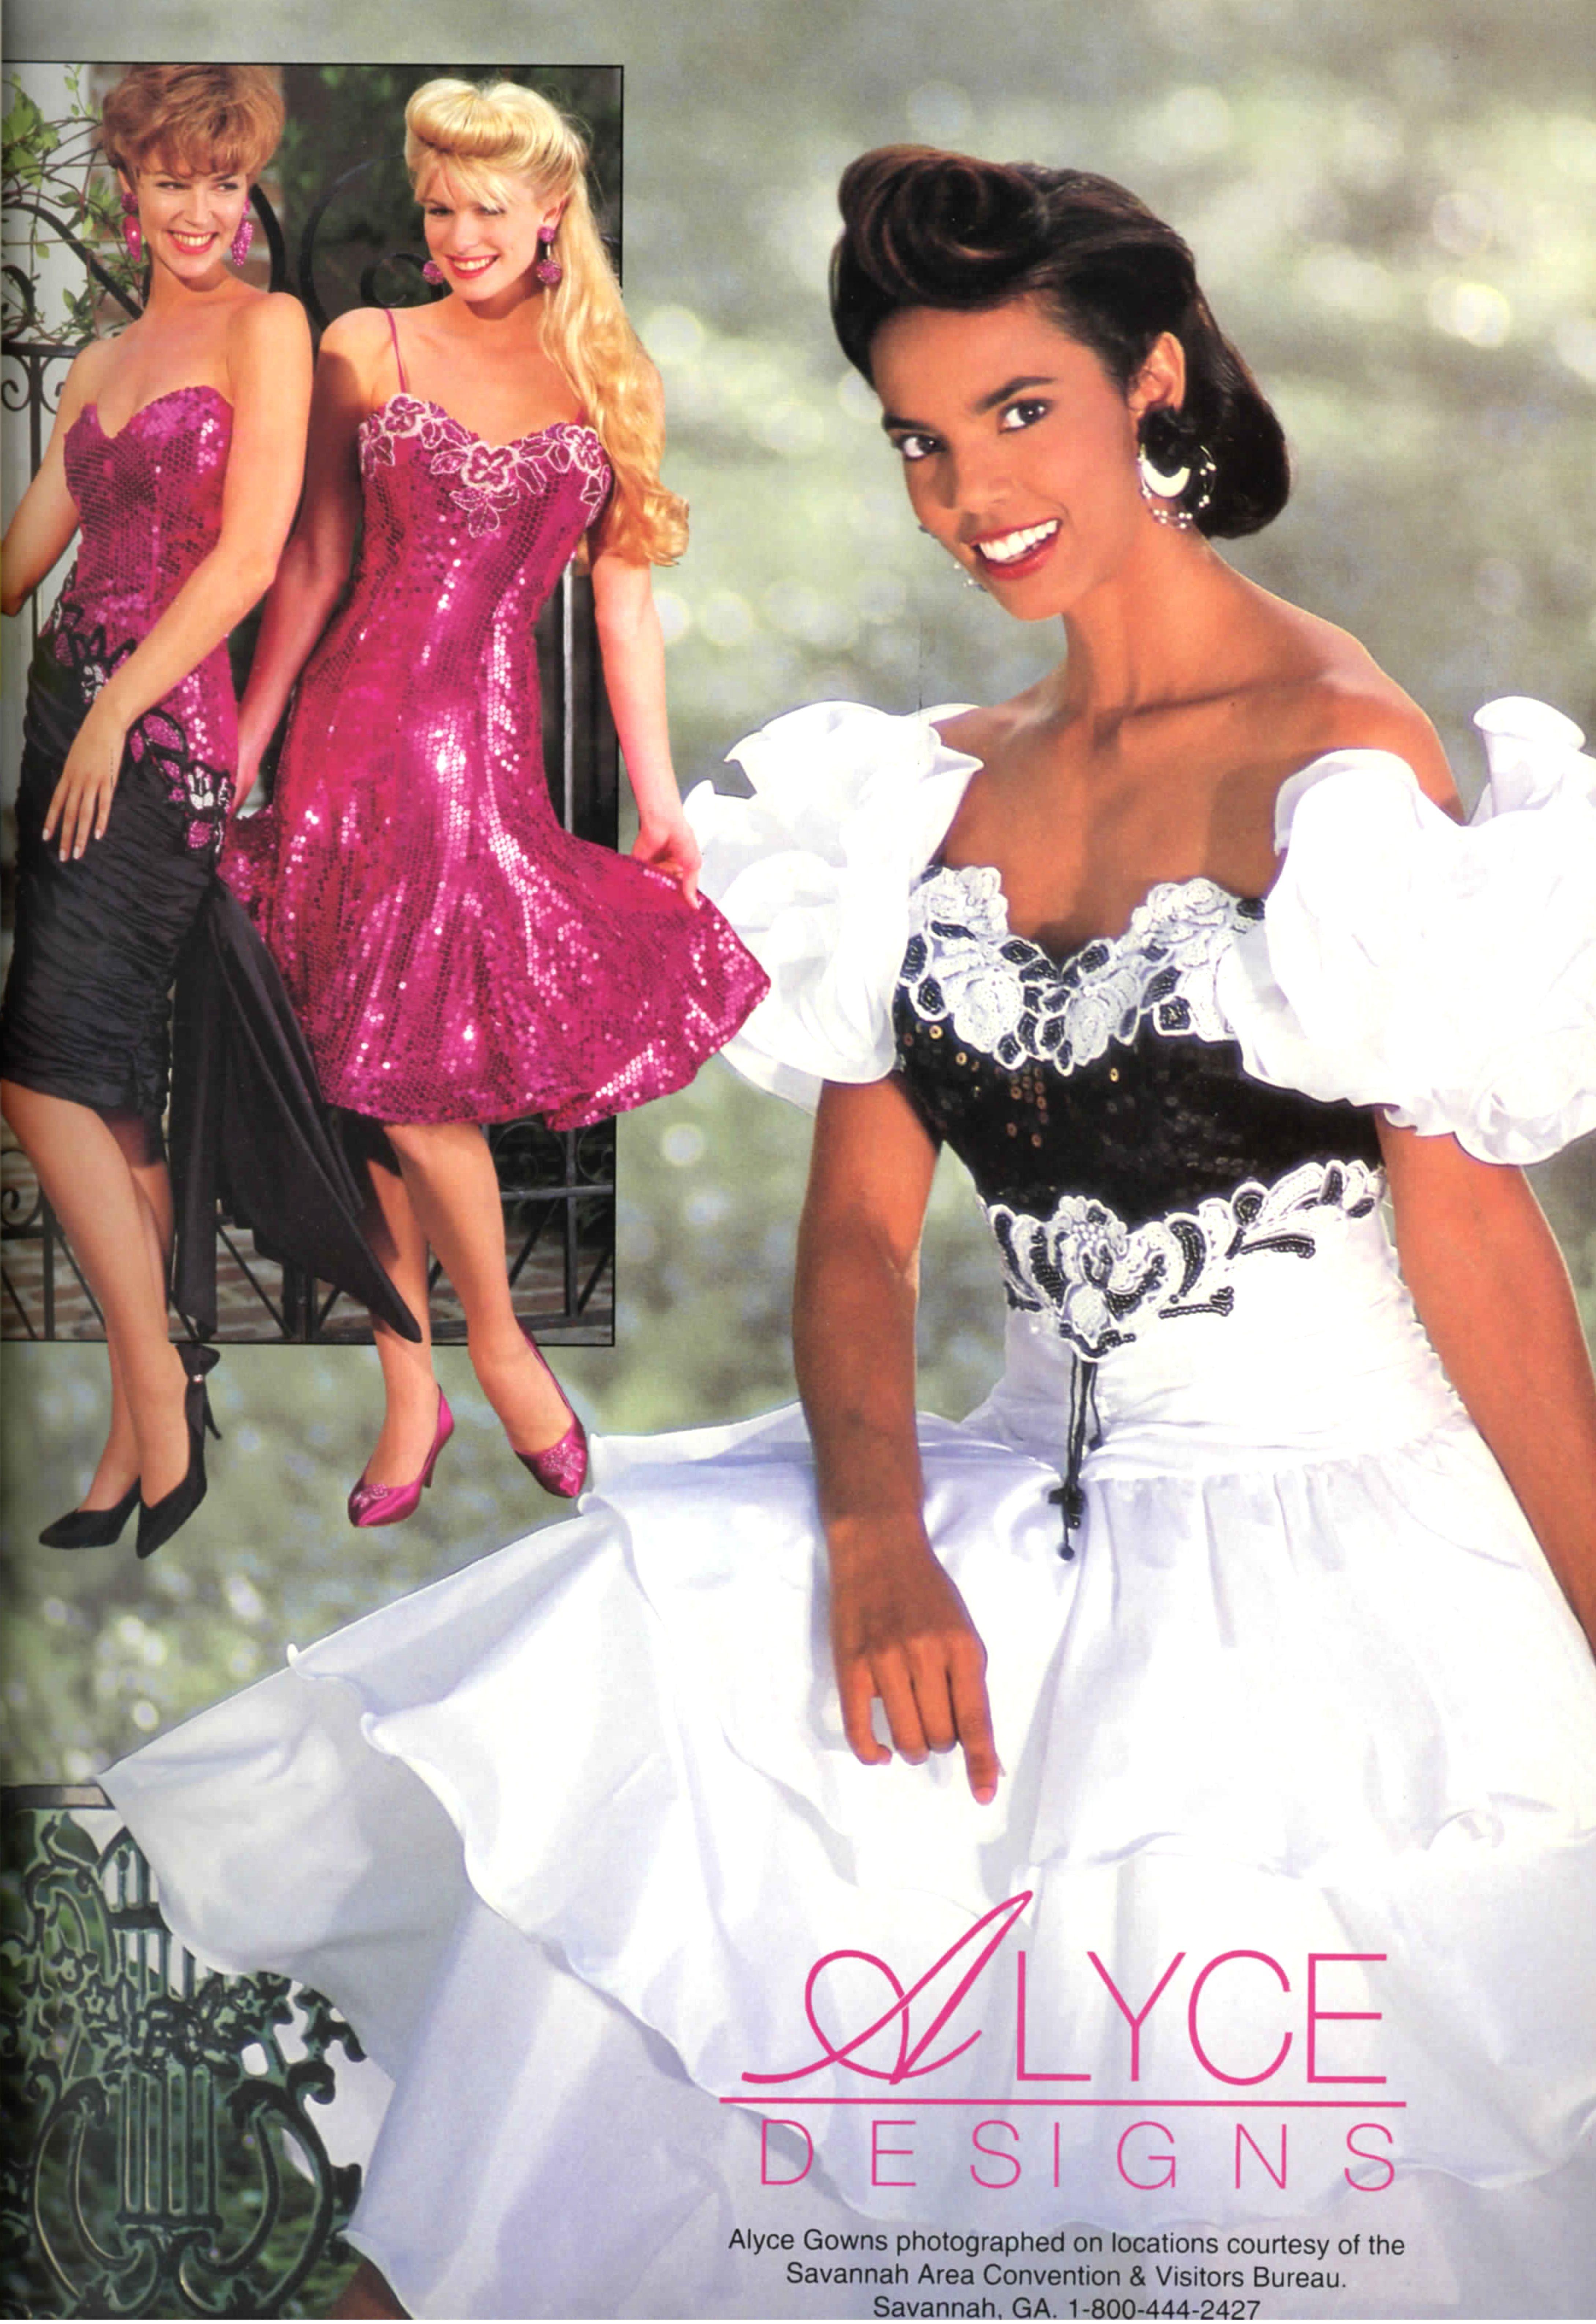 1992 Alyce Prom Dresses 80s Prom Dress 80s Prom Dress Costume 80s Prom [ 6344 x 4357 Pixel ]